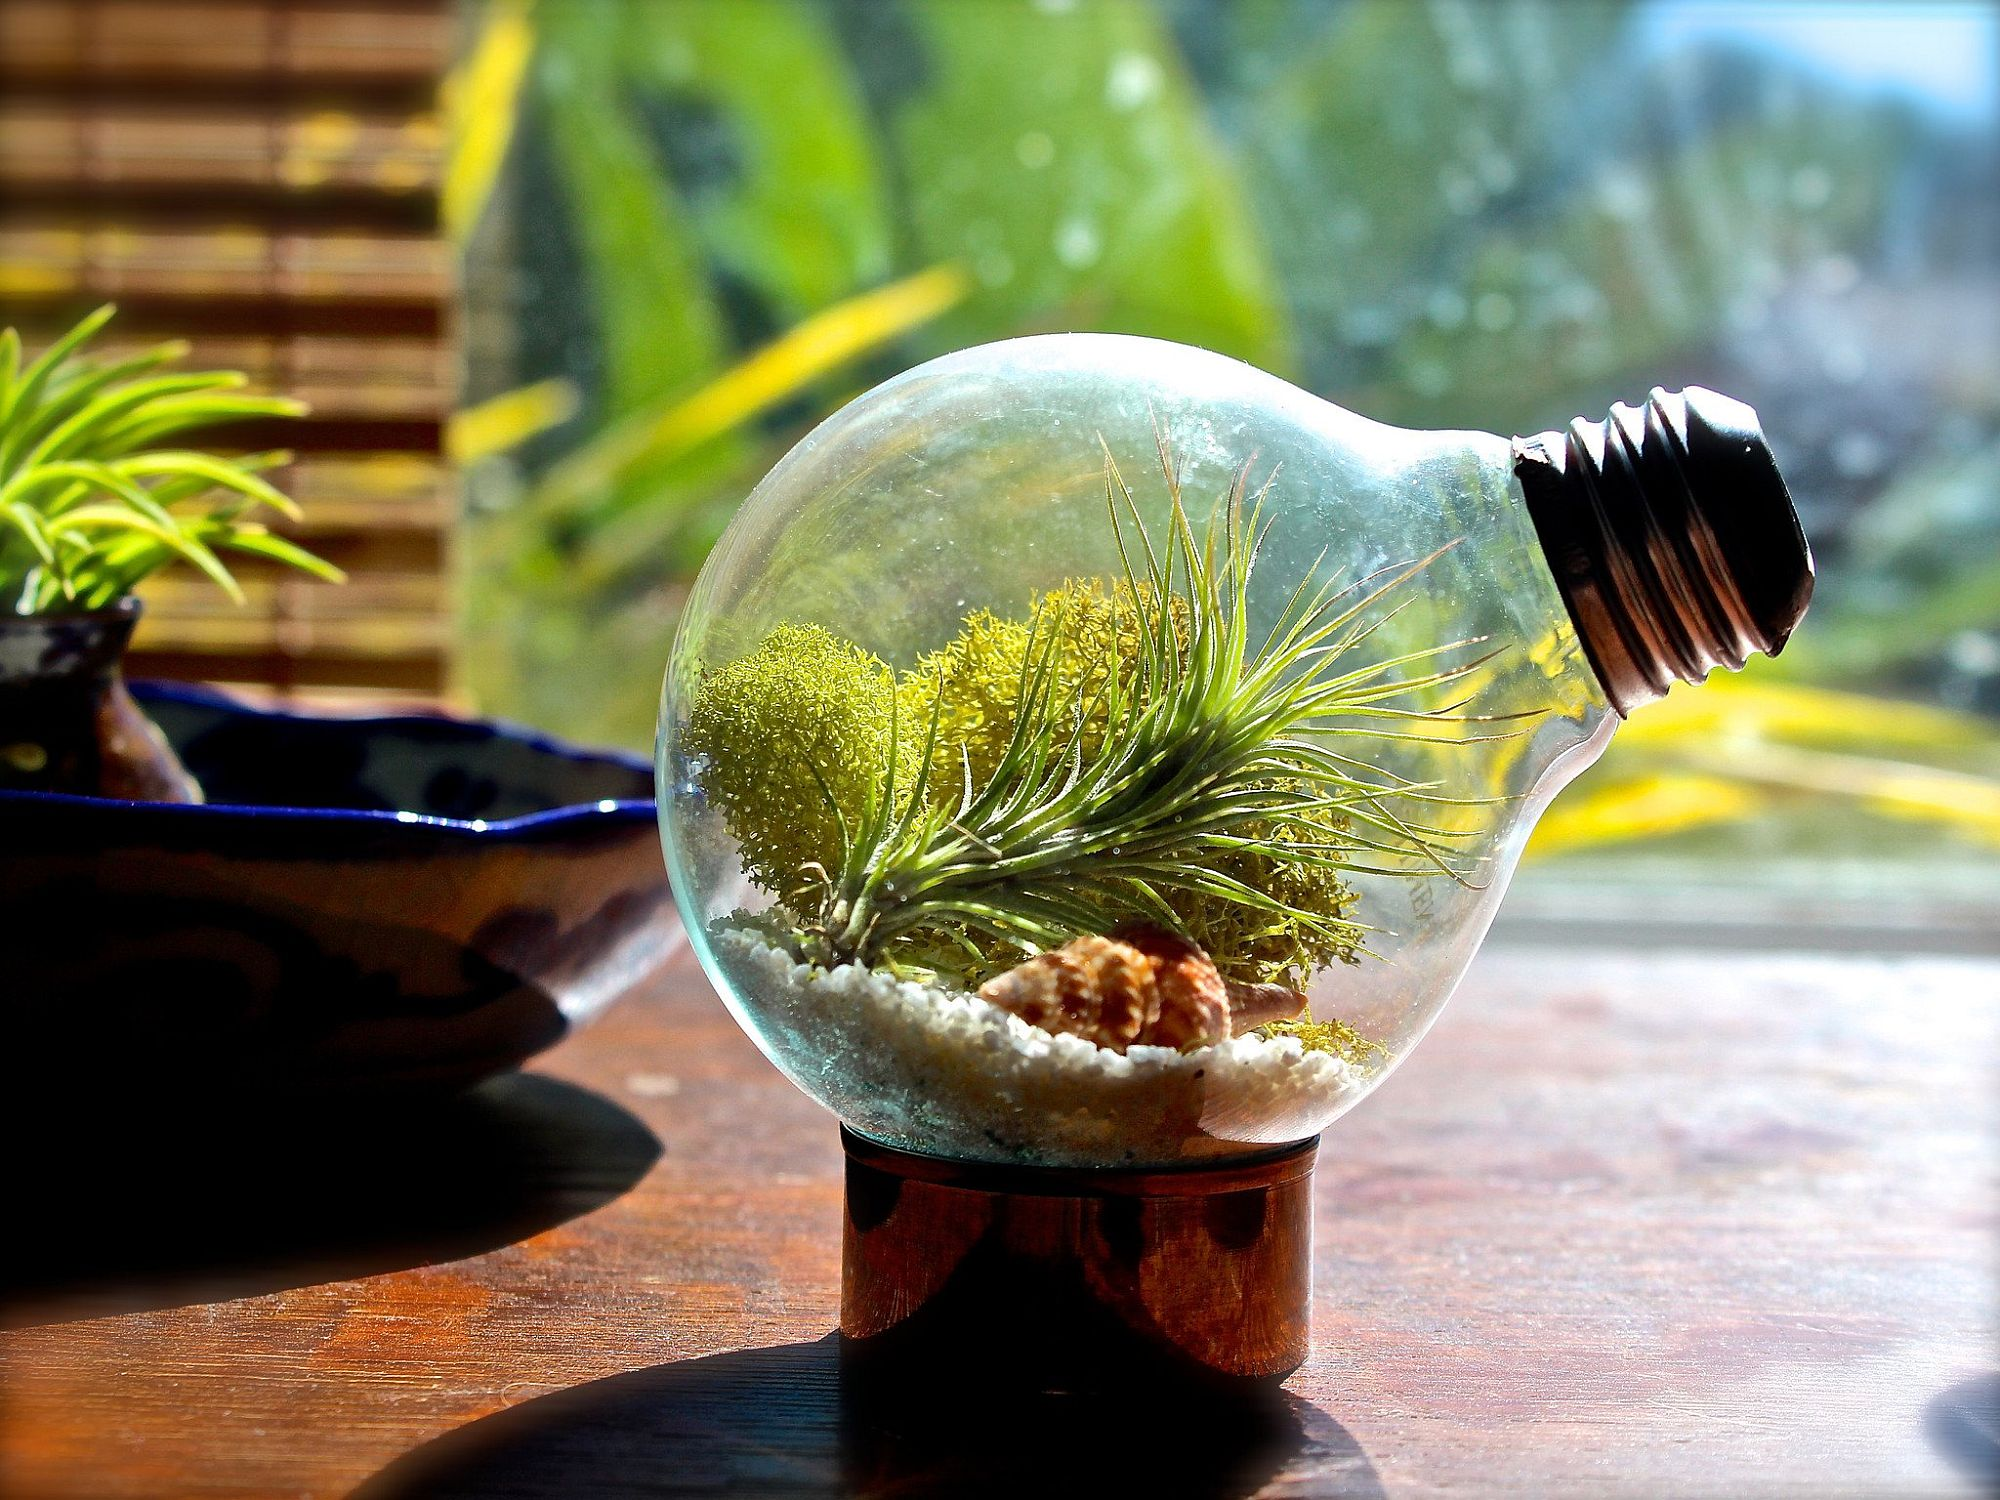 15 delightfully diverse diy terrarium ideas tiny green delights. Black Bedroom Furniture Sets. Home Design Ideas